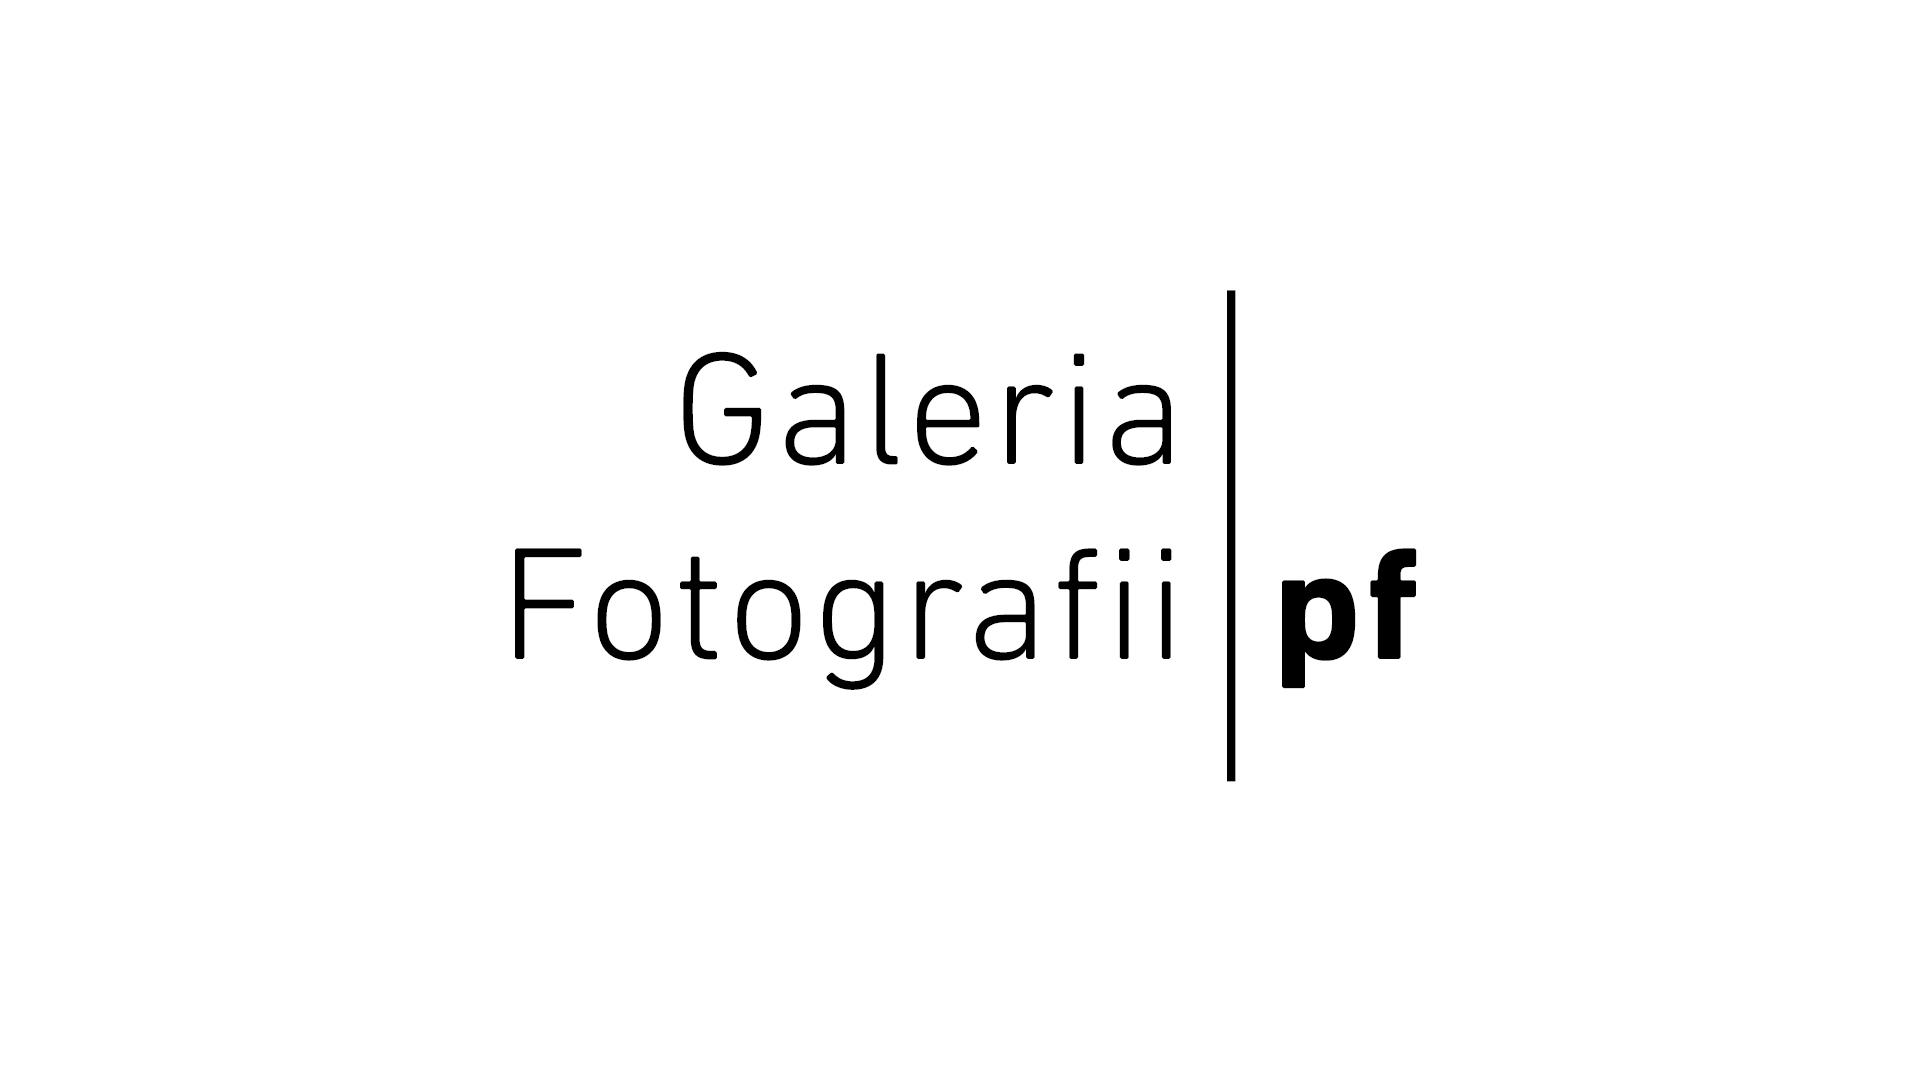 Galeria Fotografii PF